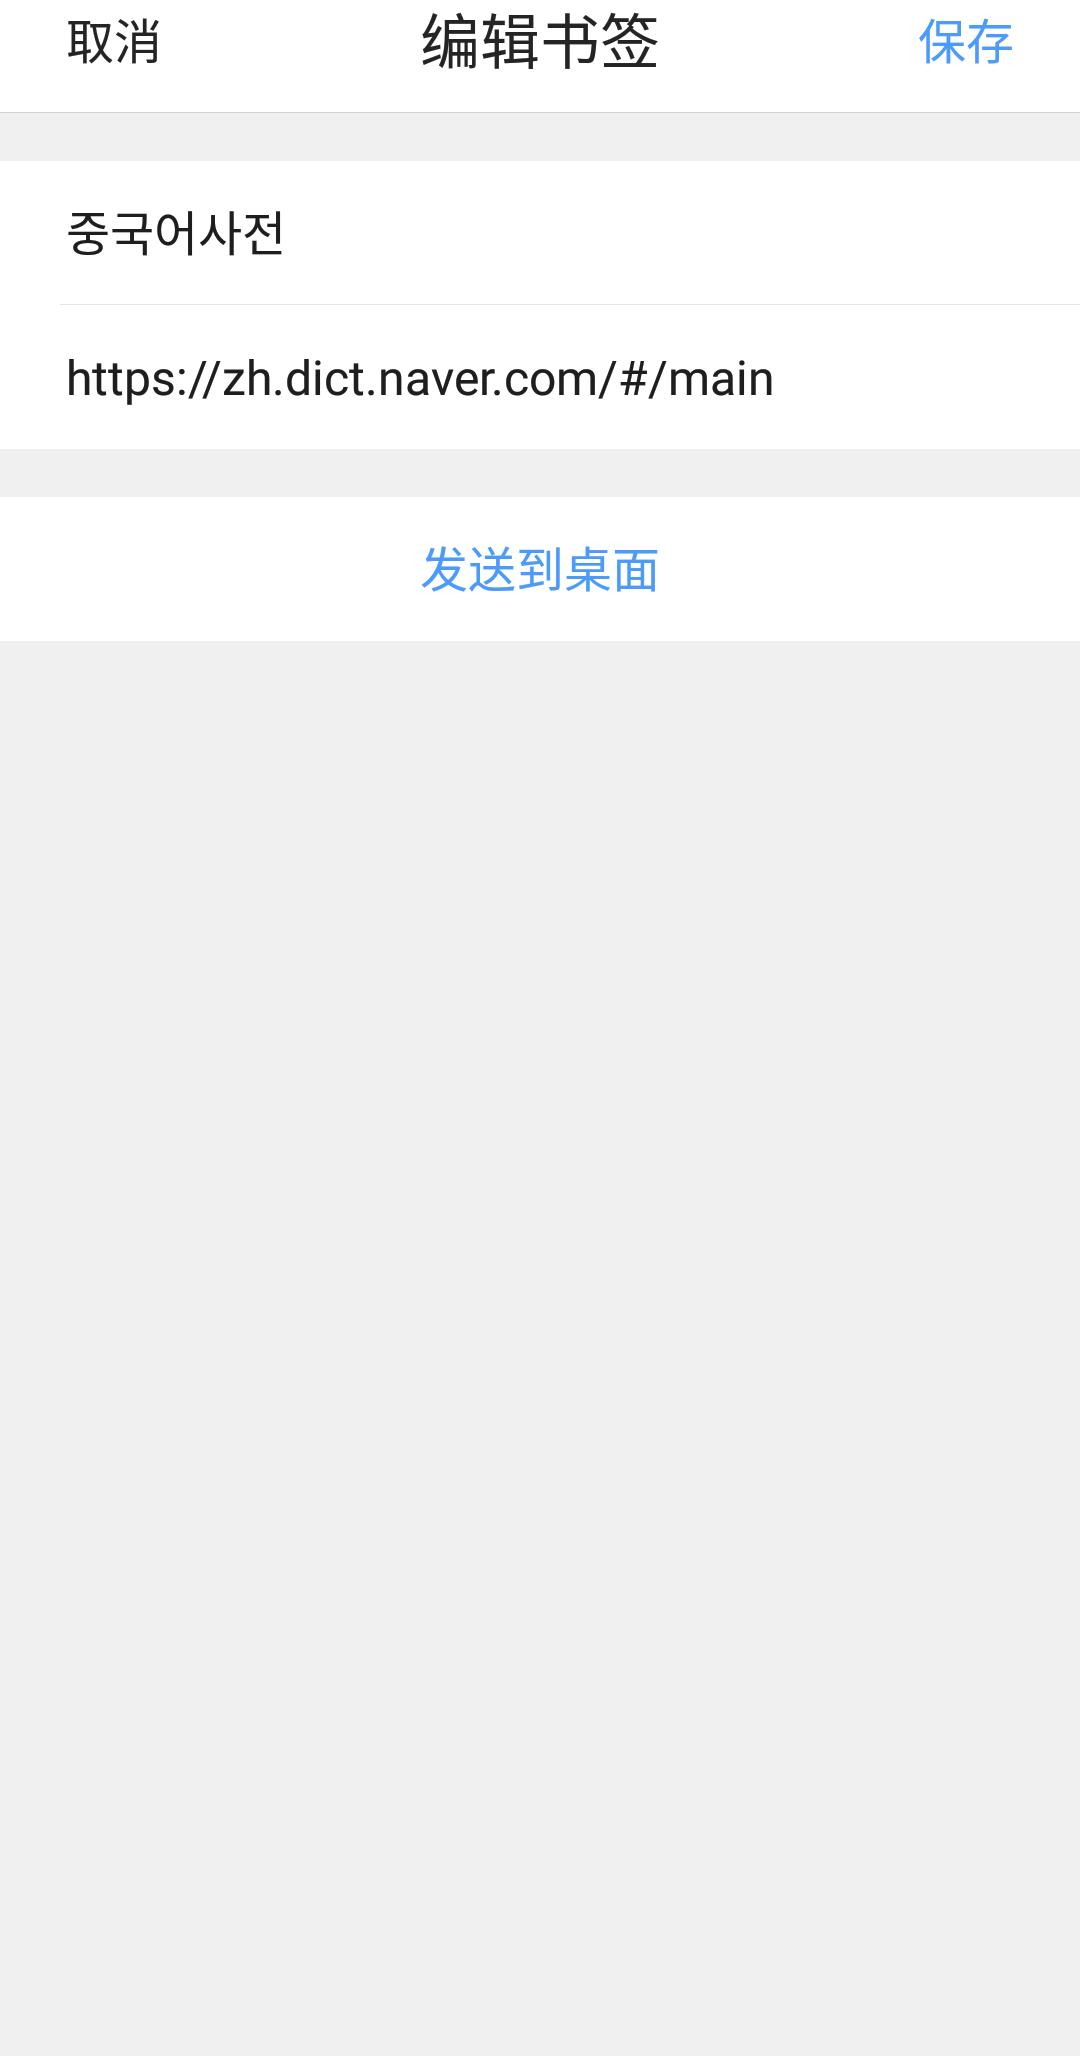 Screenshot_2018-06-16-20-51-10.png